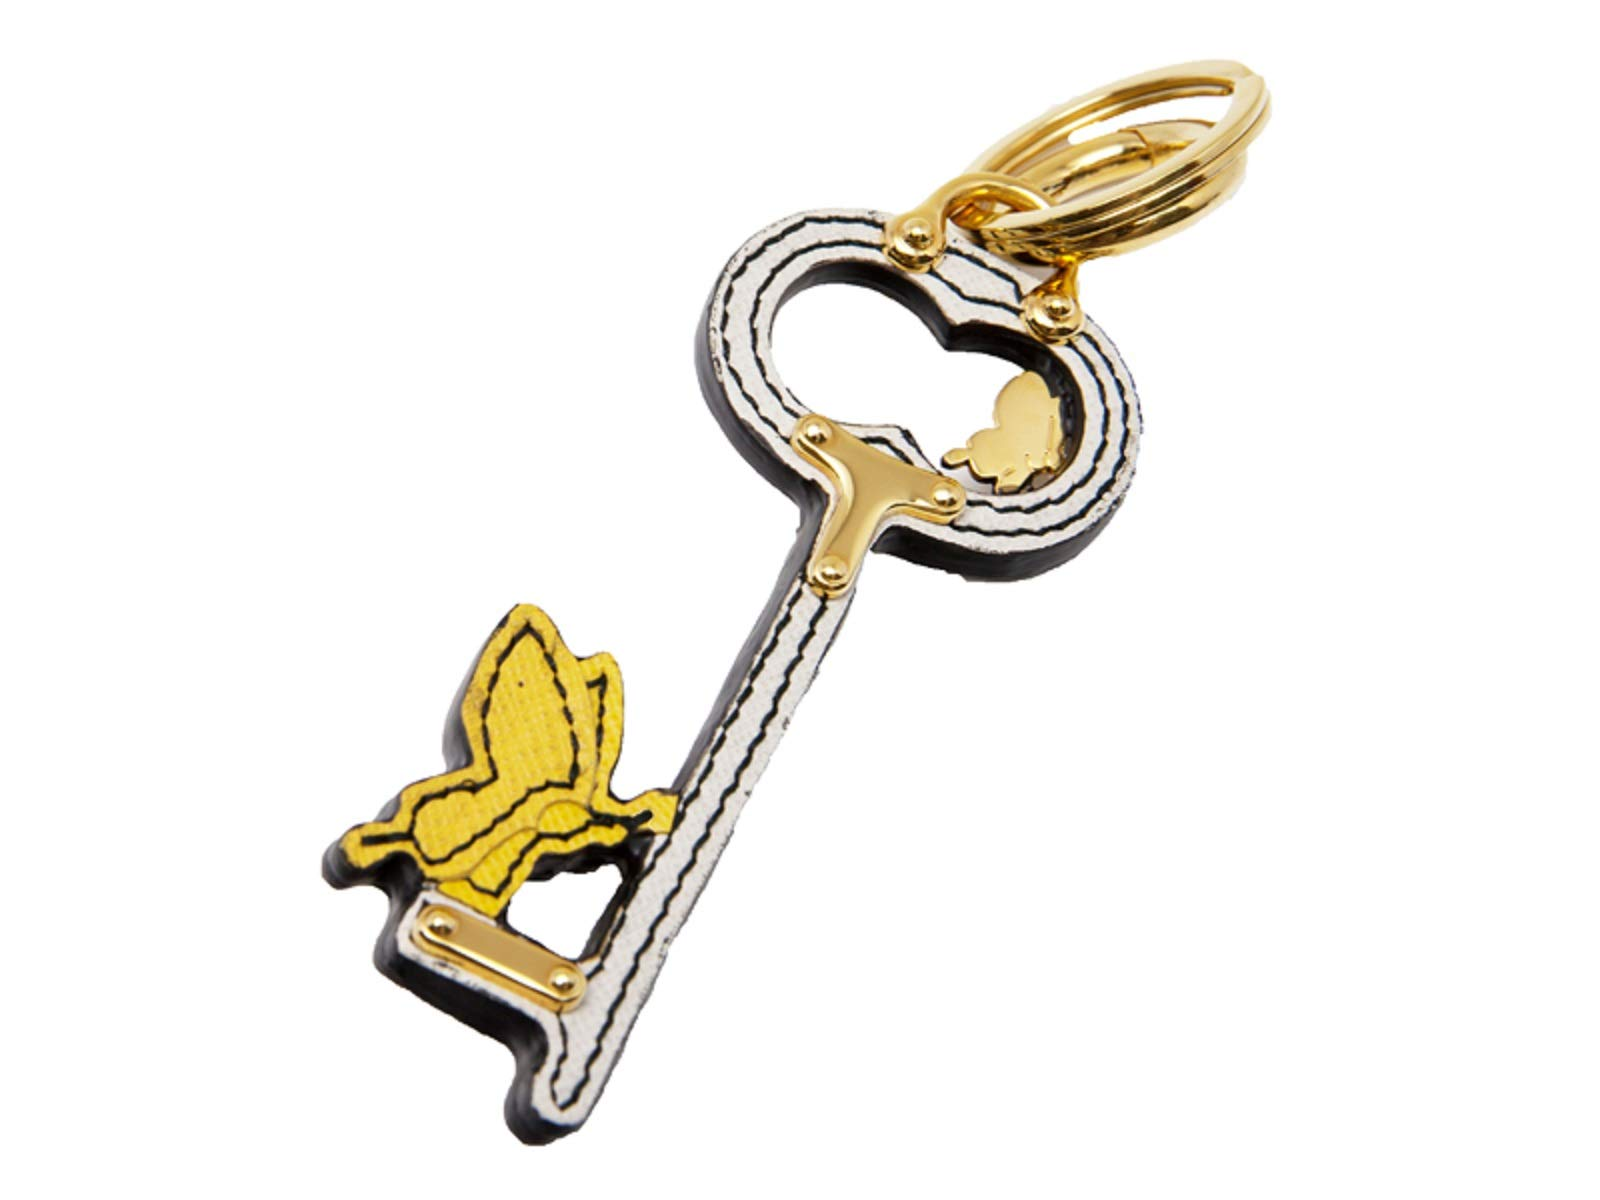 Prada Leather Key Chain Rick in Pelle Tu Saffinano Key White Black And Gold 1TL069